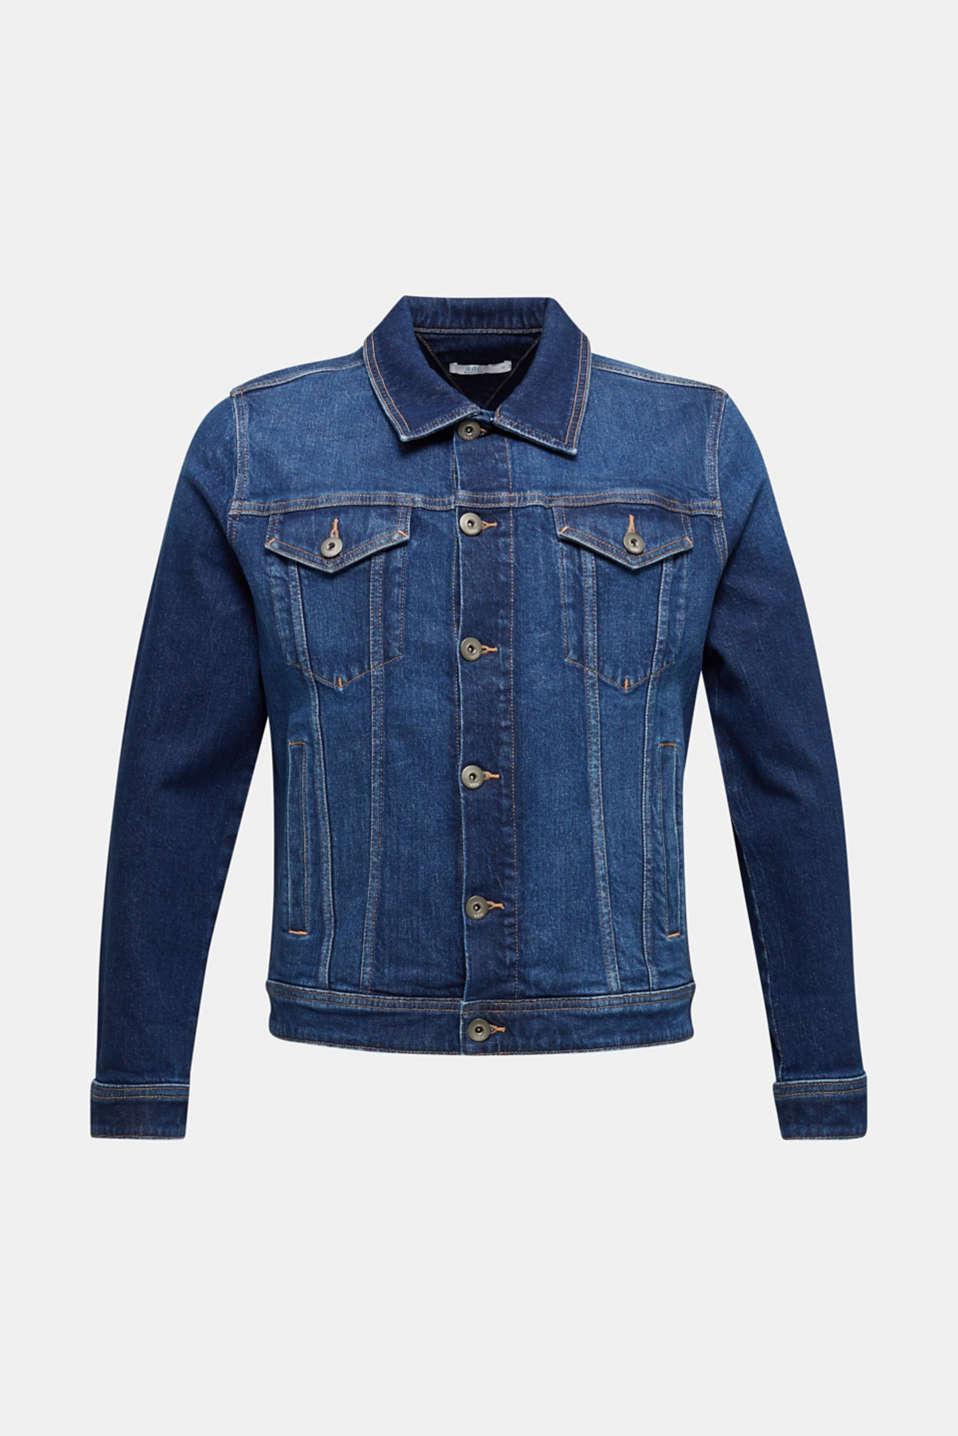 Jean jacket with a print, BLUE DARK WASH, detail image number 7